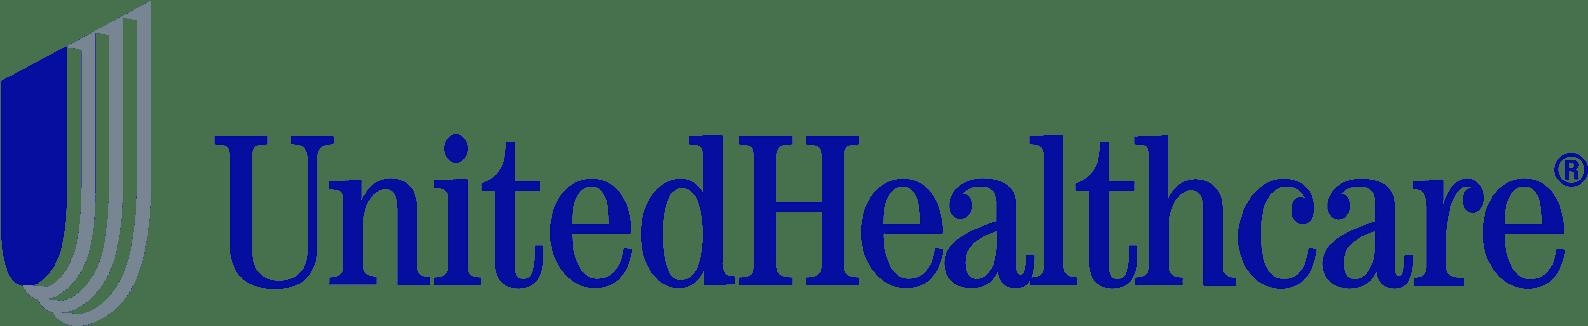 united healthcare logo on blue background